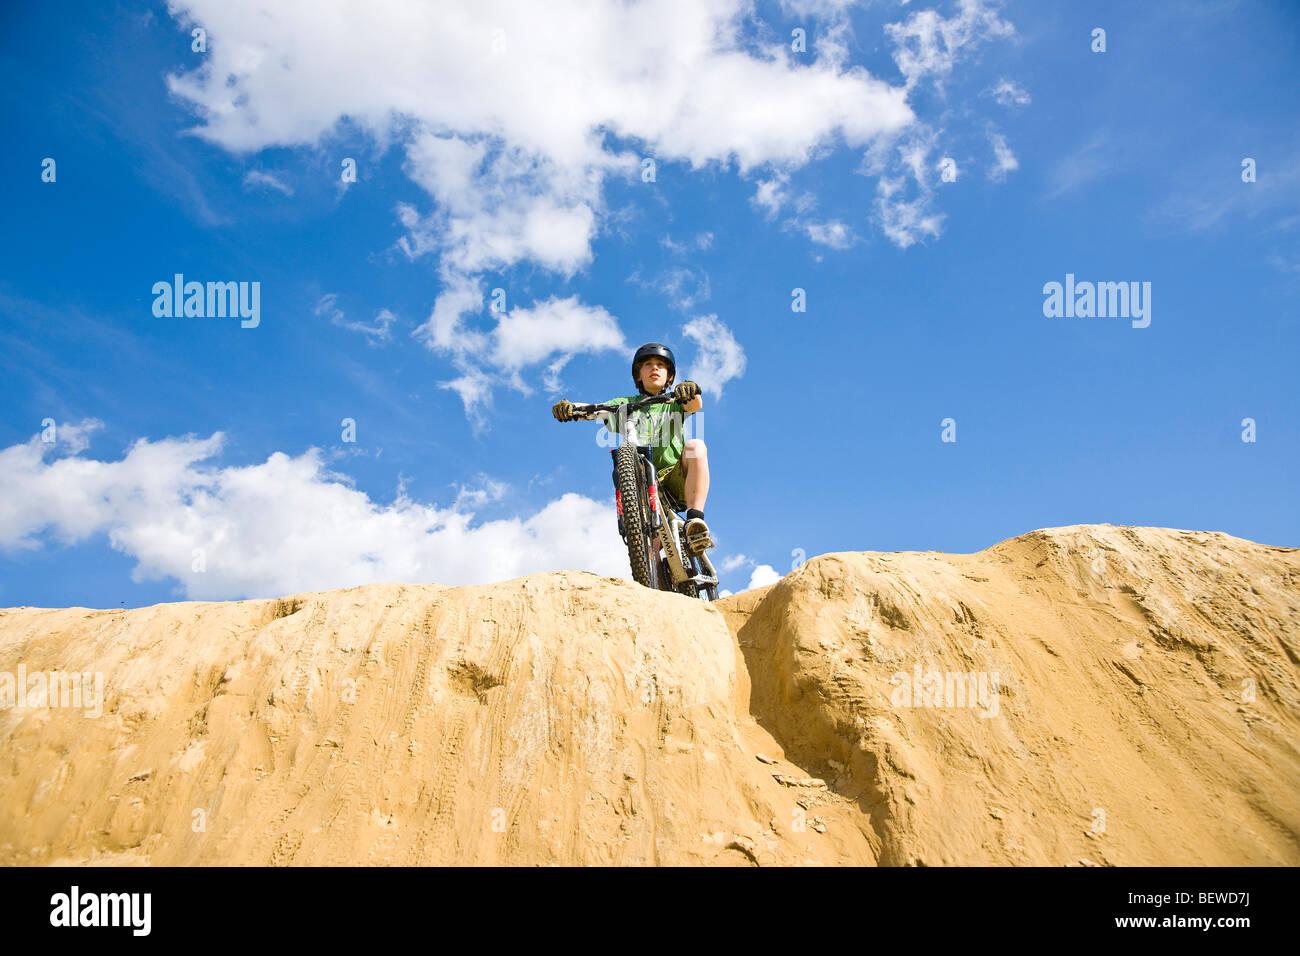 Teenager Mountainbiker, Blick von unten Stockbild